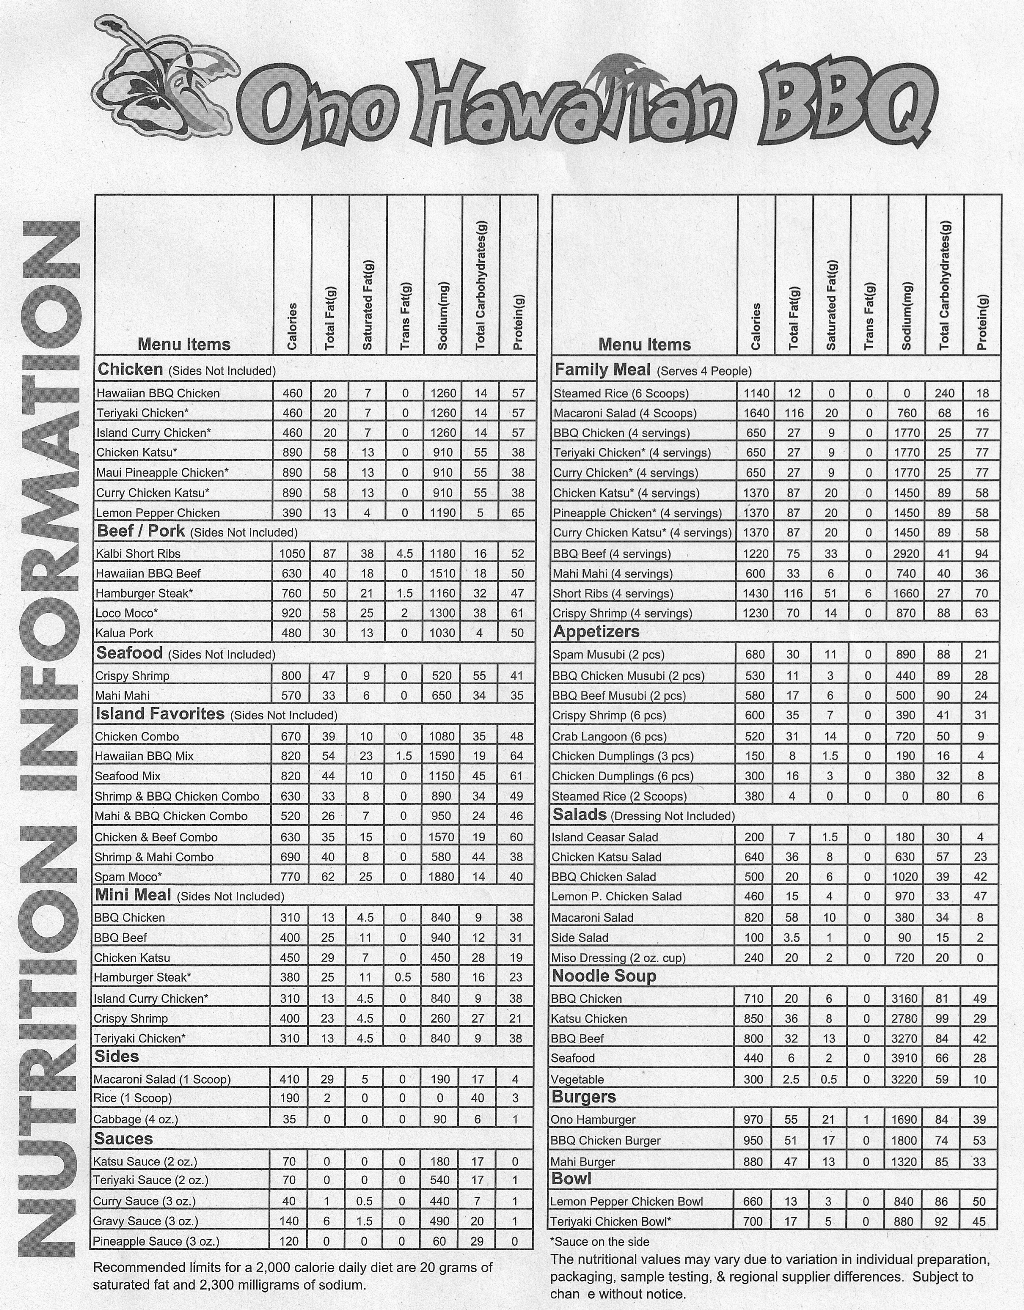 ono bbq nutrition